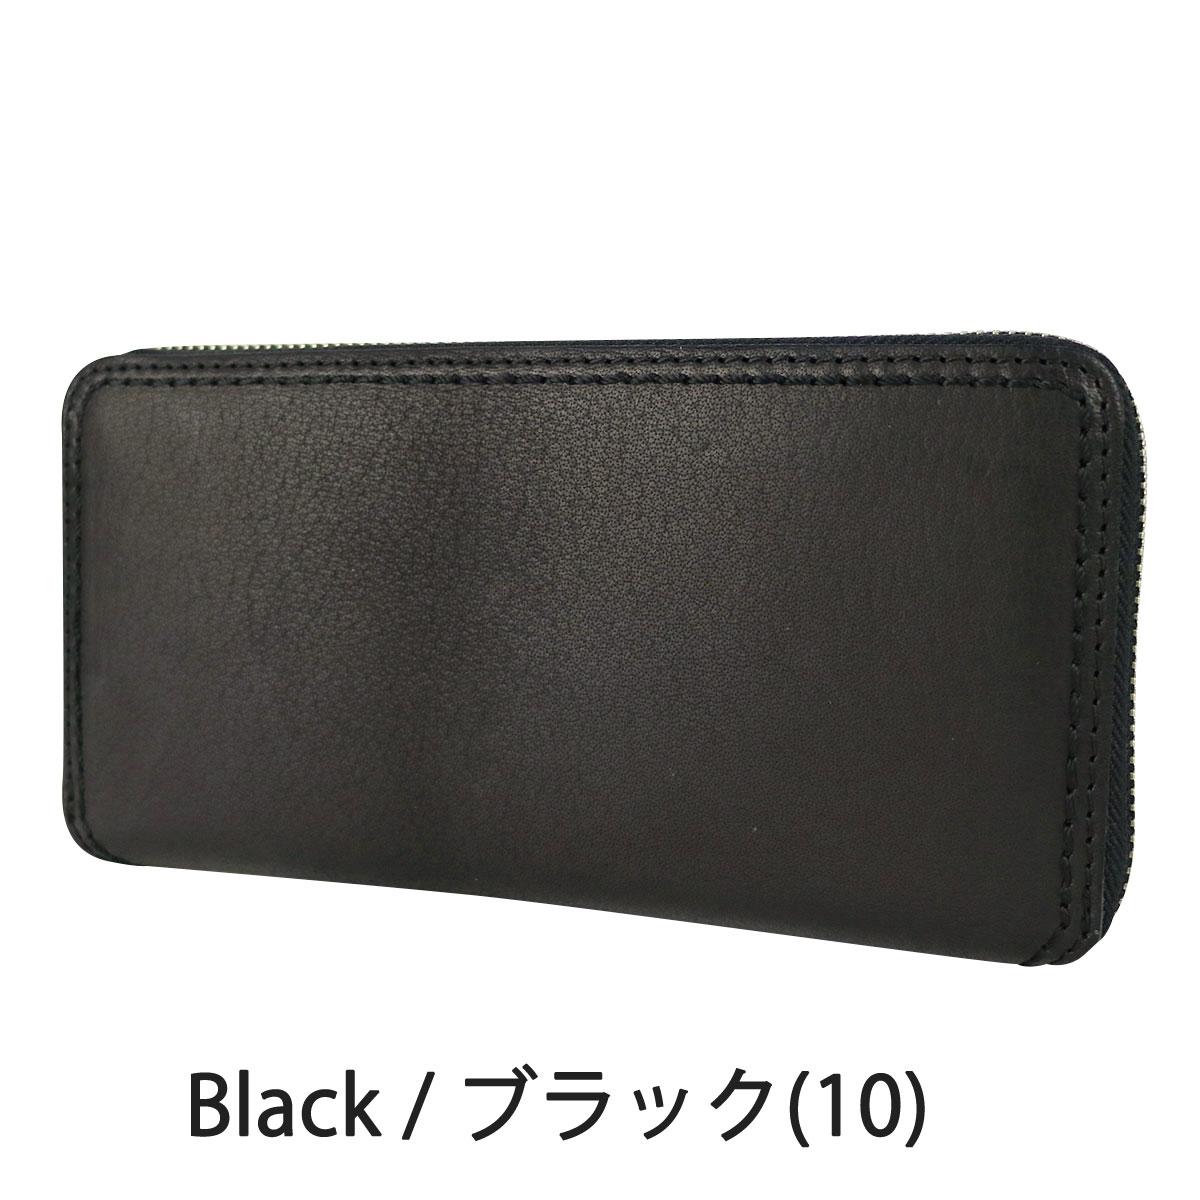 GALLERIA Bag-Luggage: NELD錢包拉鍊輪男士女士皮革FINE AN108   日本樂天市場